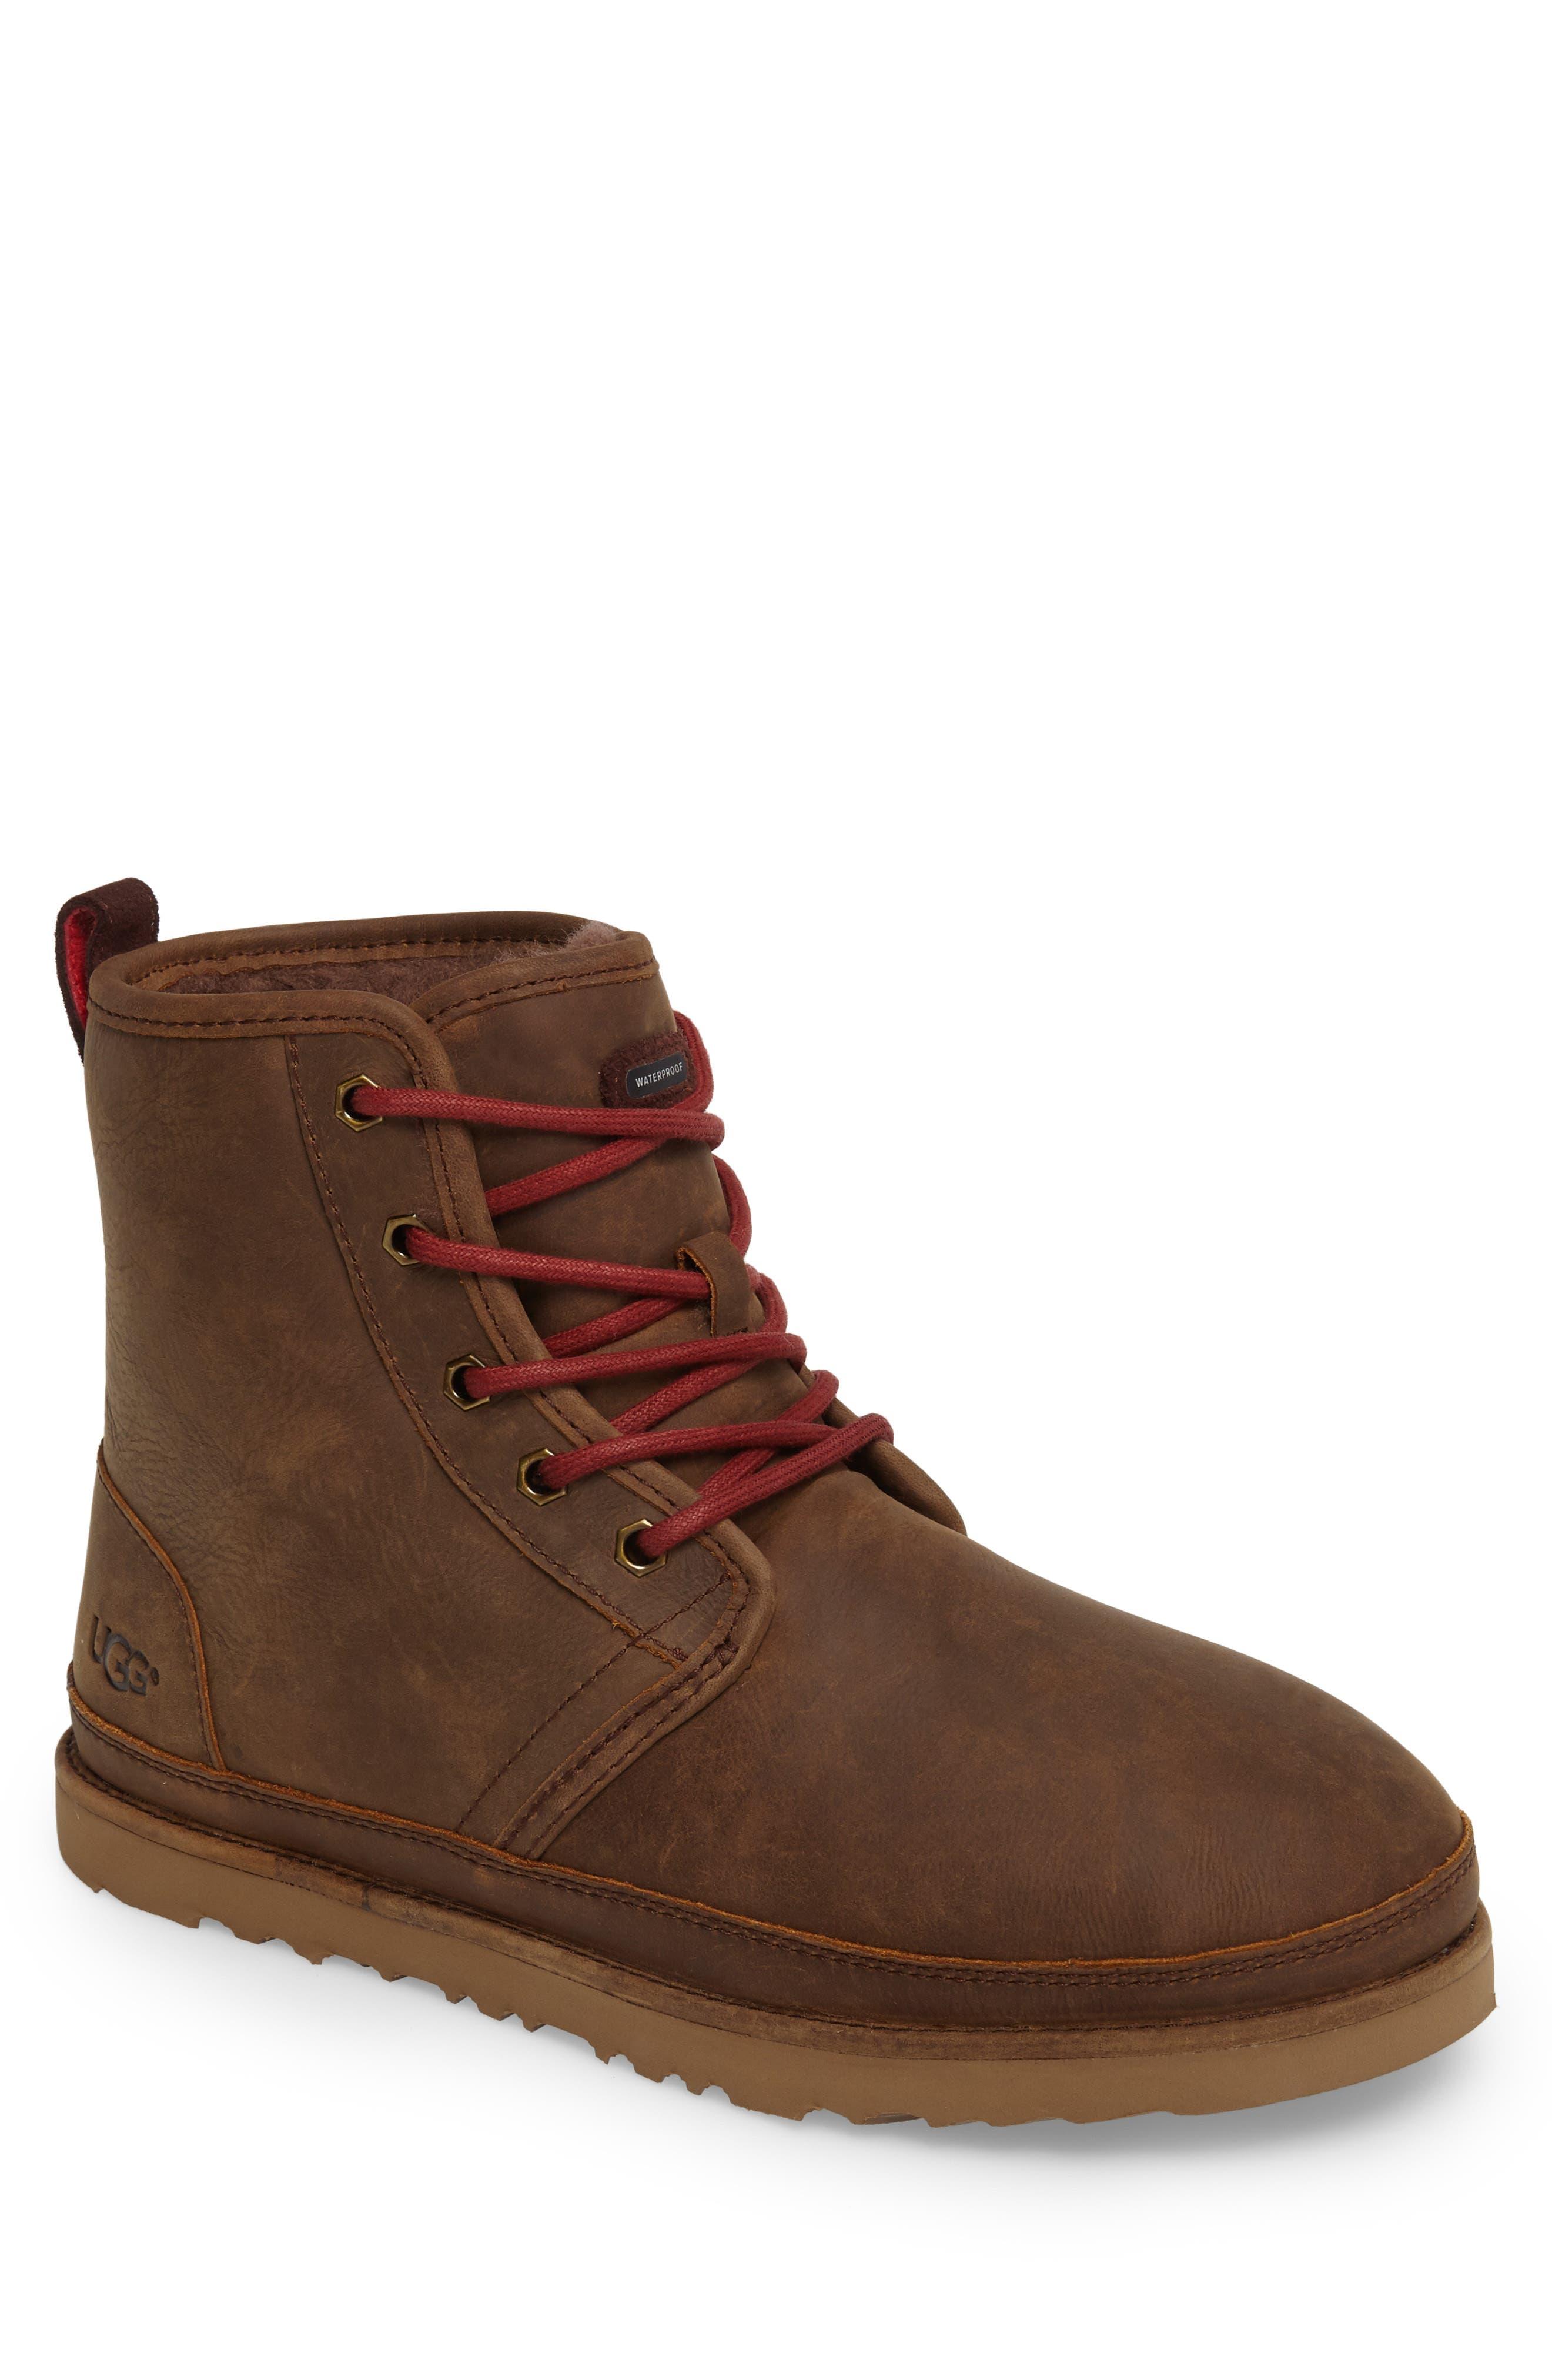 Ugg Harkley Plain Toe Waterproof Waterproof Boot, Brown